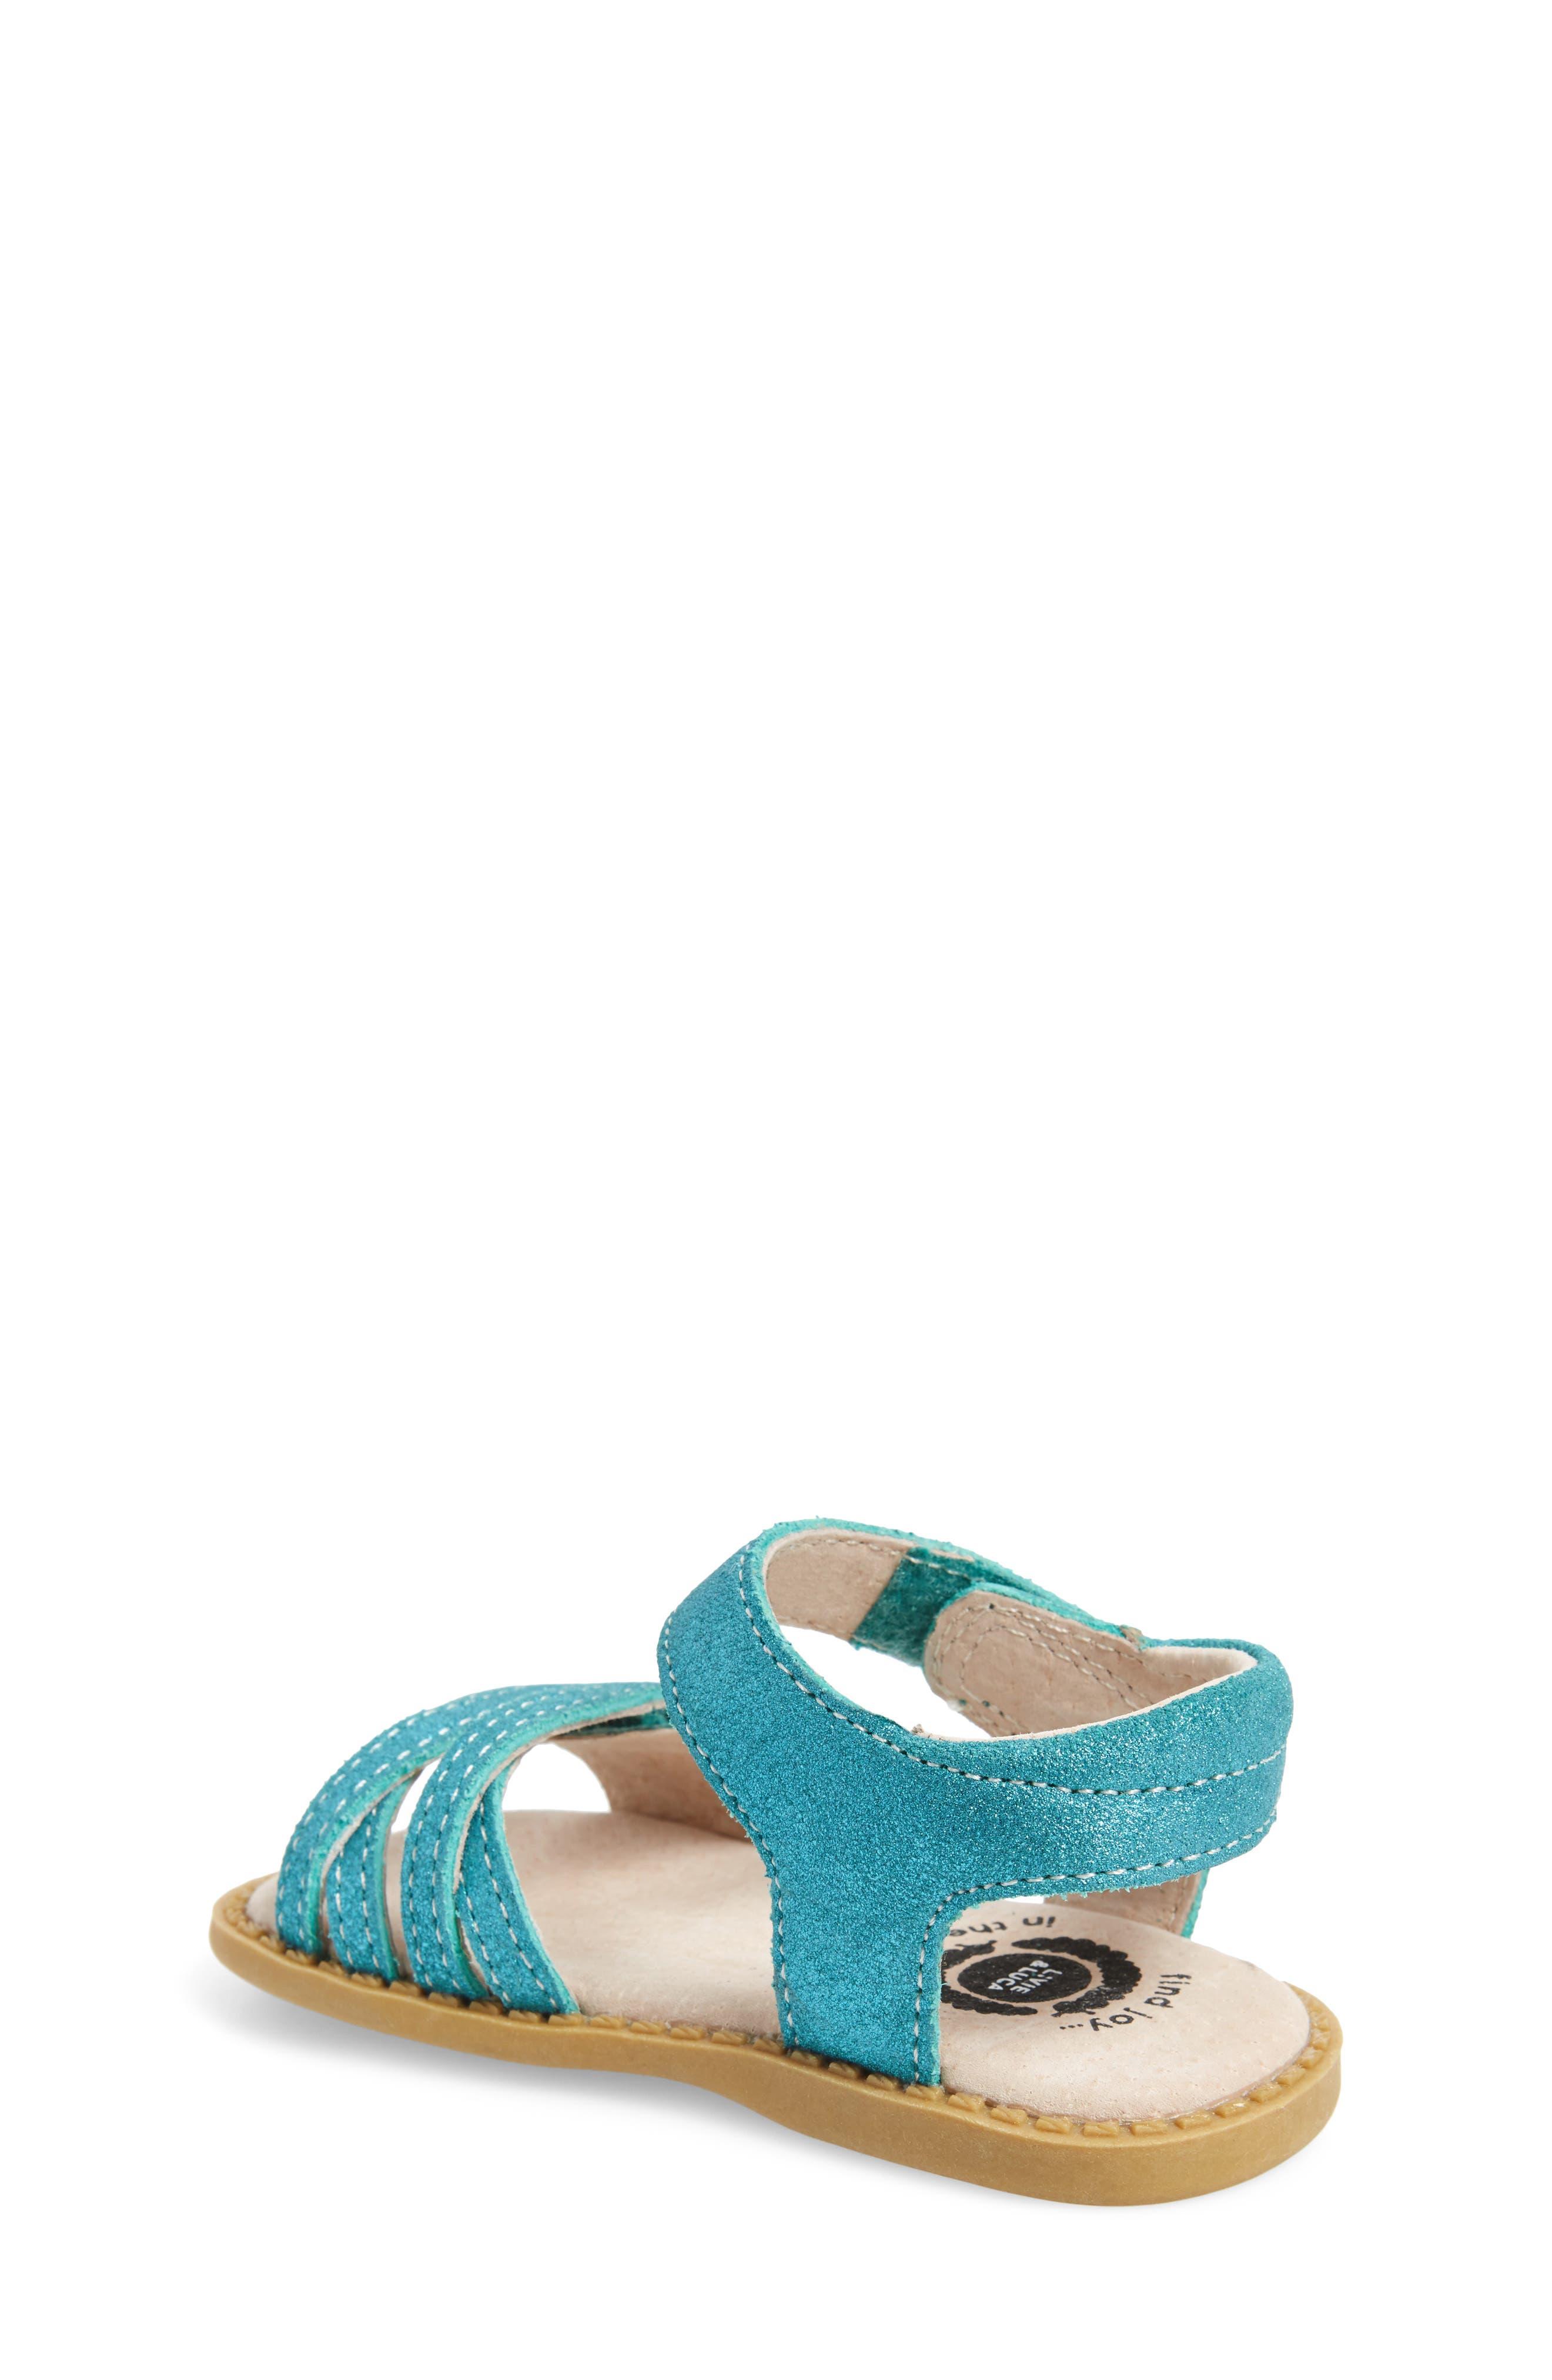 'Athena' Sandal,                             Alternate thumbnail 2, color,                             Aqua Shimmer